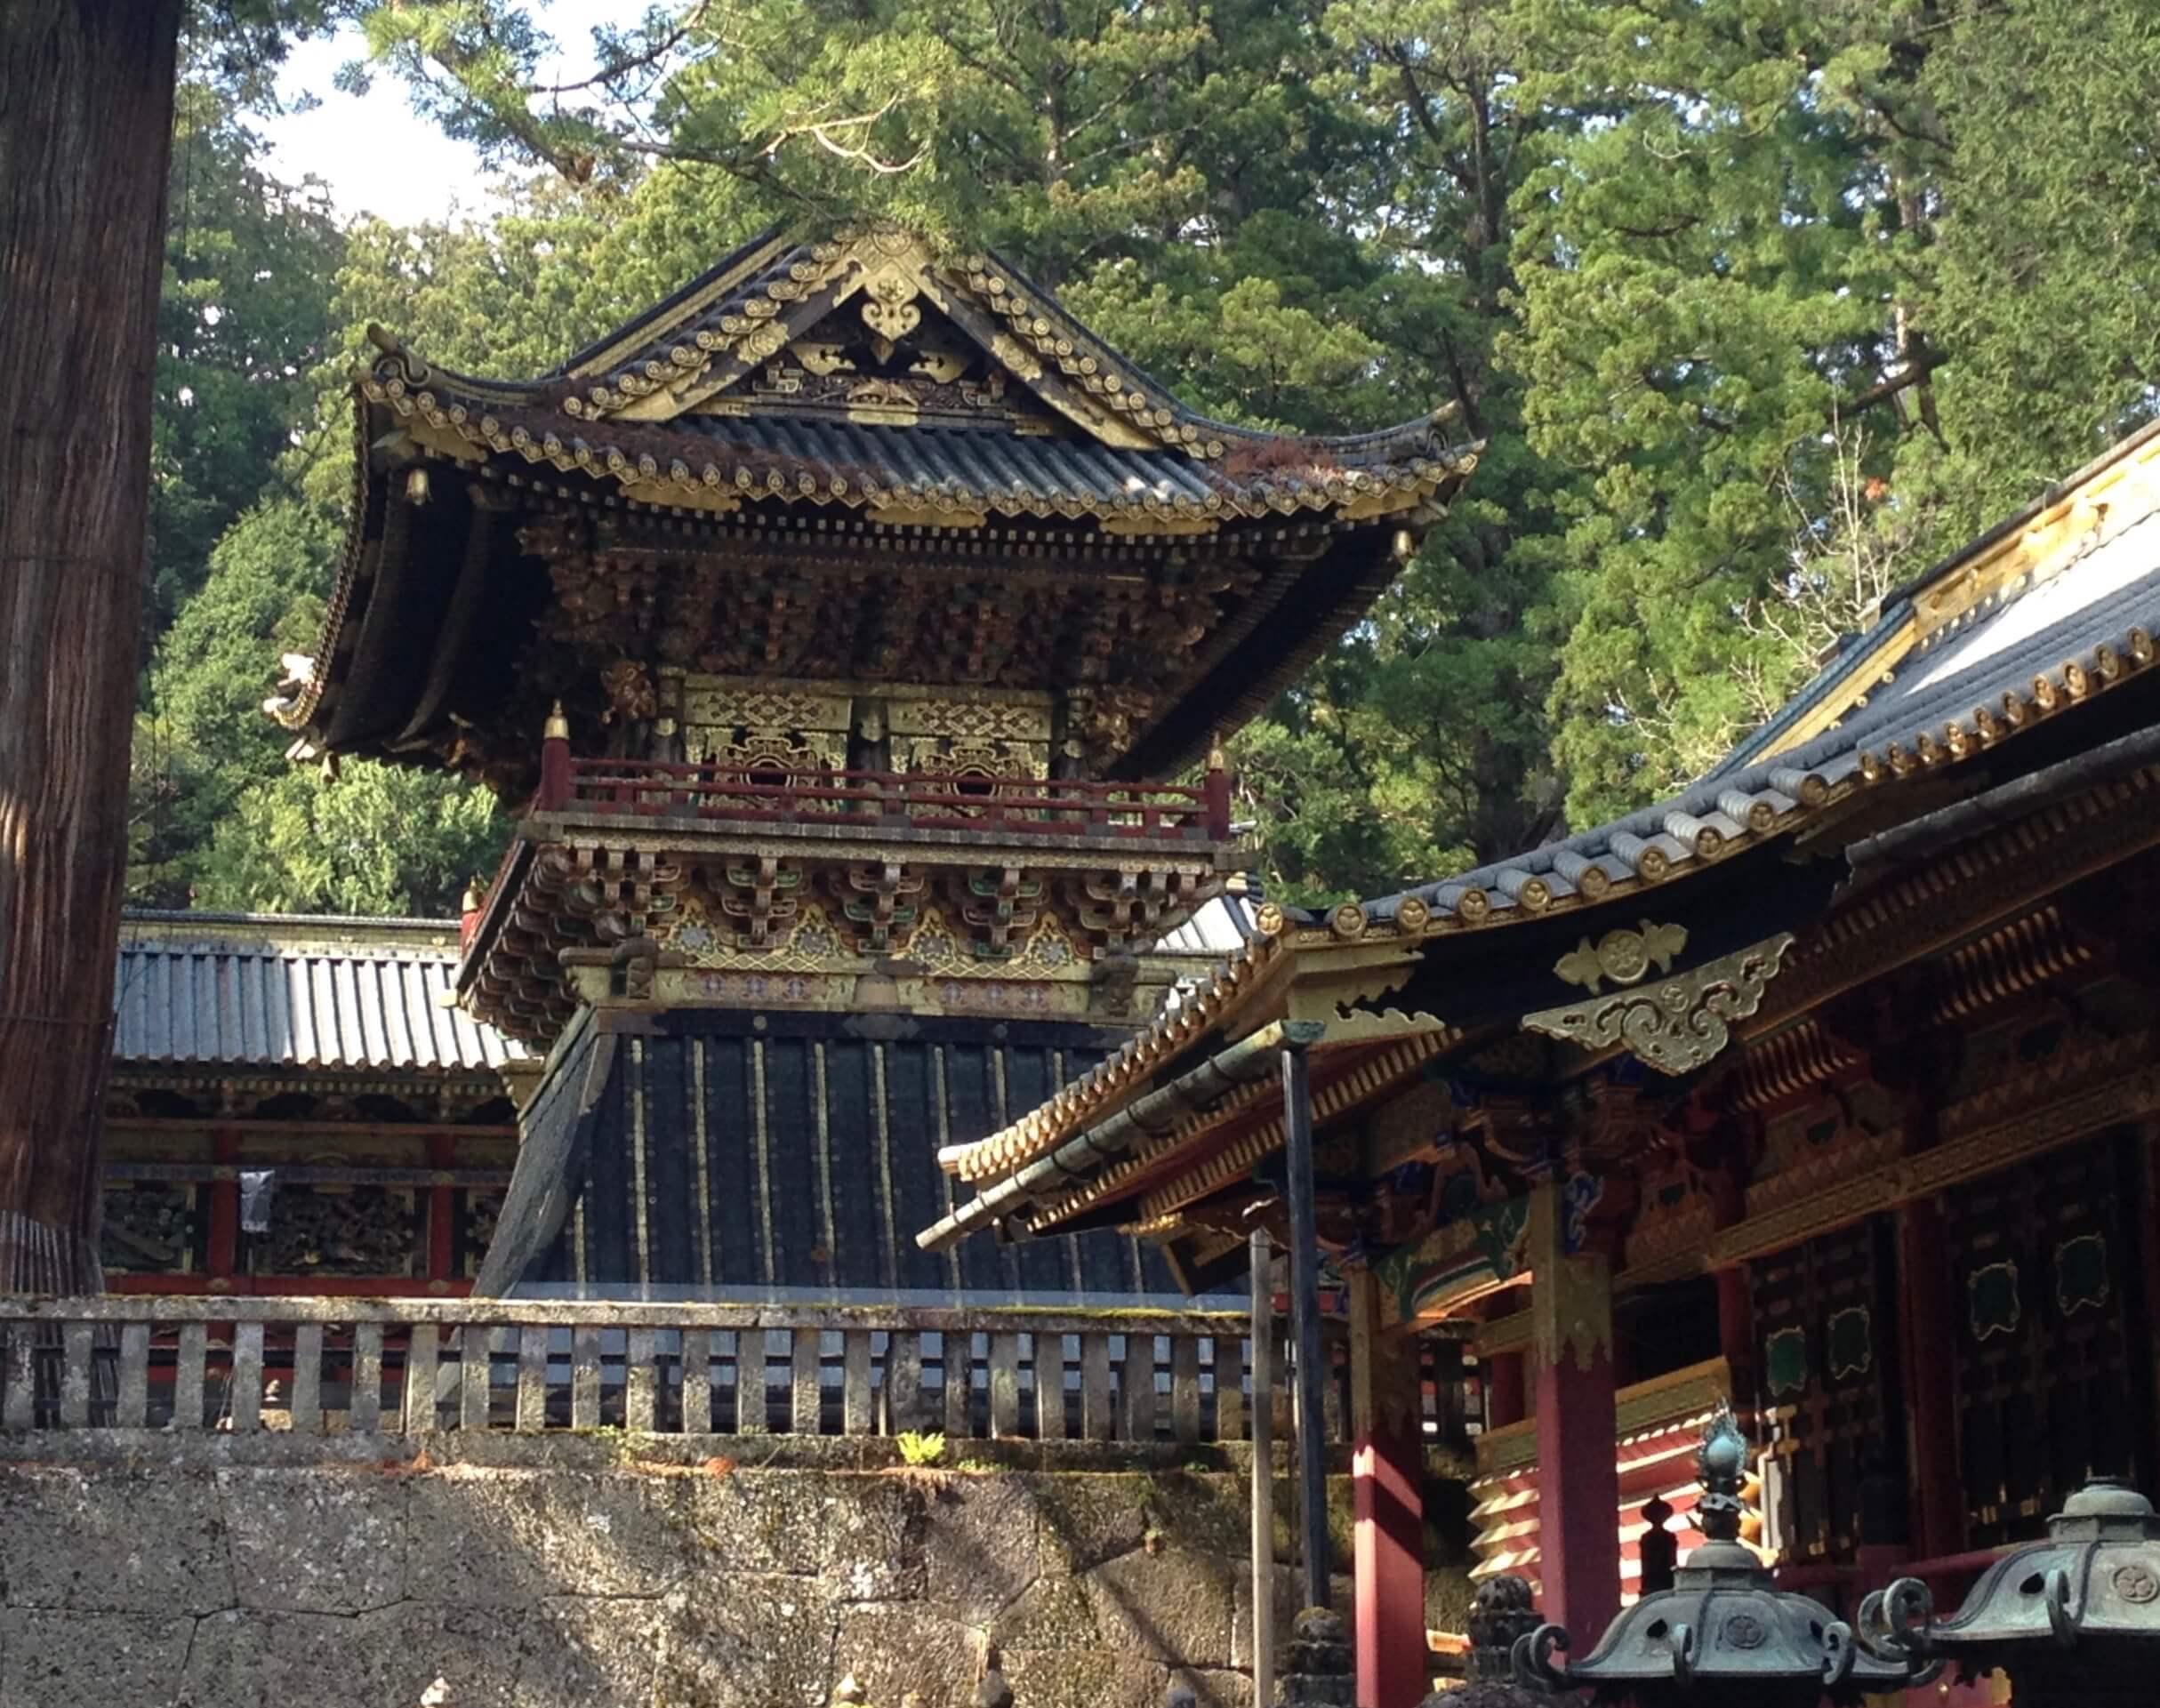 Tokugawa's mausoleum in Nikko